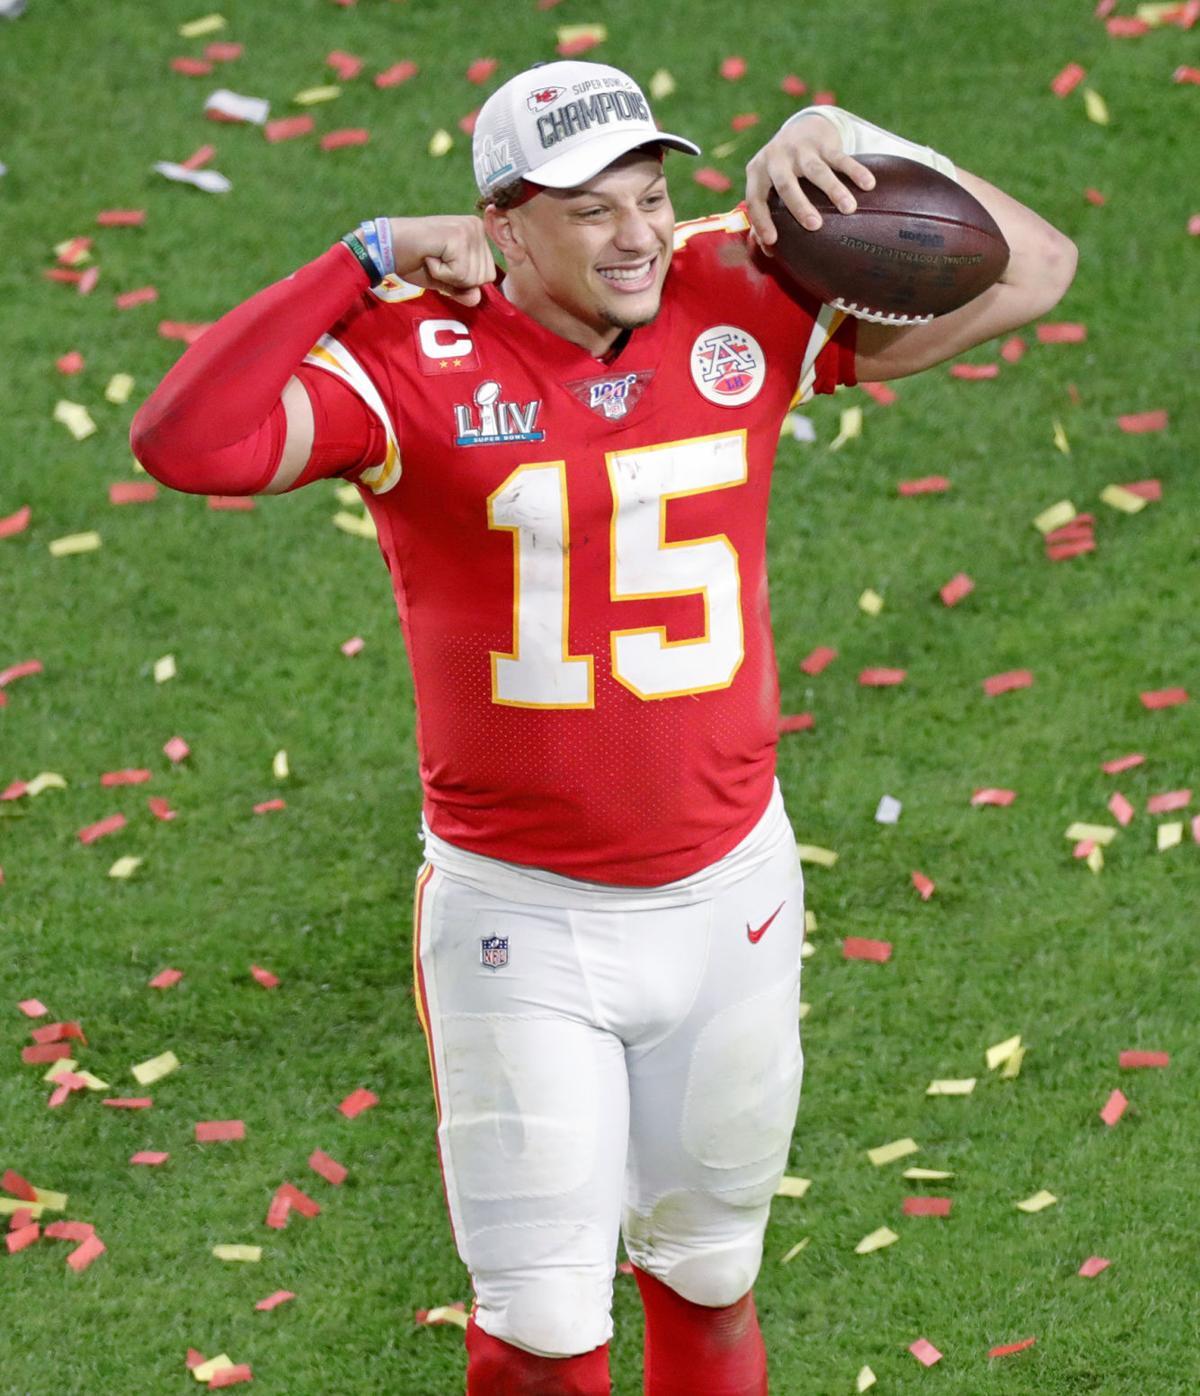 Kansas City Chiefs quarterback Patrick Mahomes (15) celebrates after winning Super Bowl LIV, 31-20, against the San Francisco 49ers at Hard Rock Stadium in Miami Gardens, Fla., on Sunday, Feb. 2, 2020.